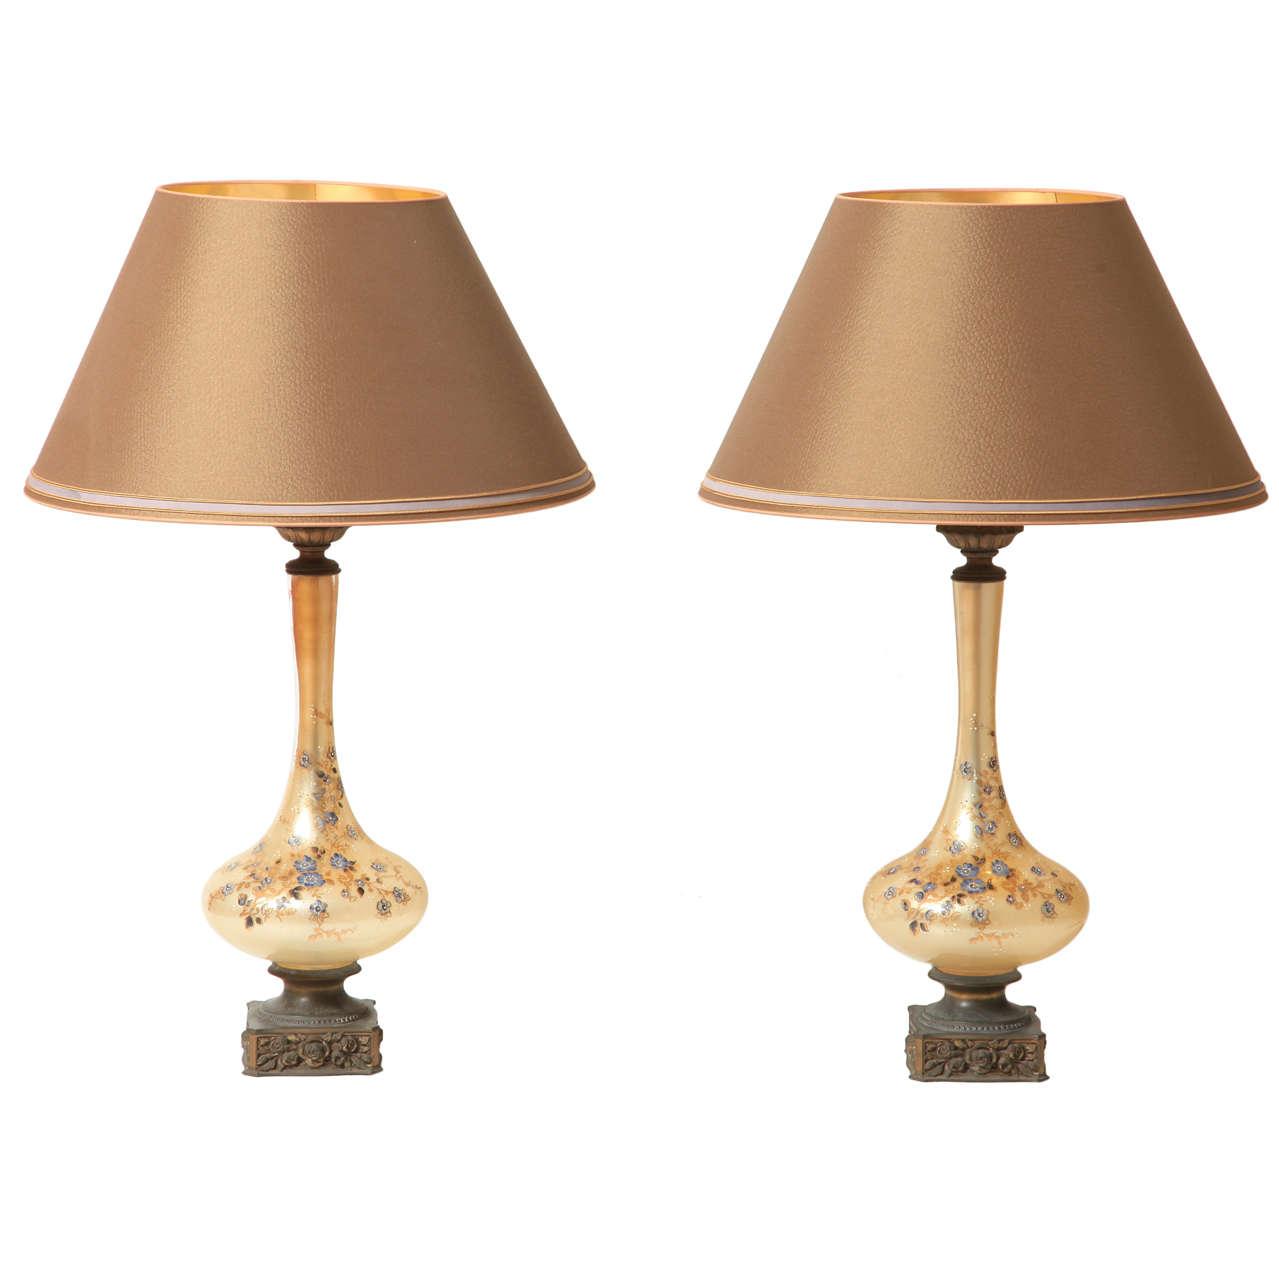 1930s lamps photo - 8